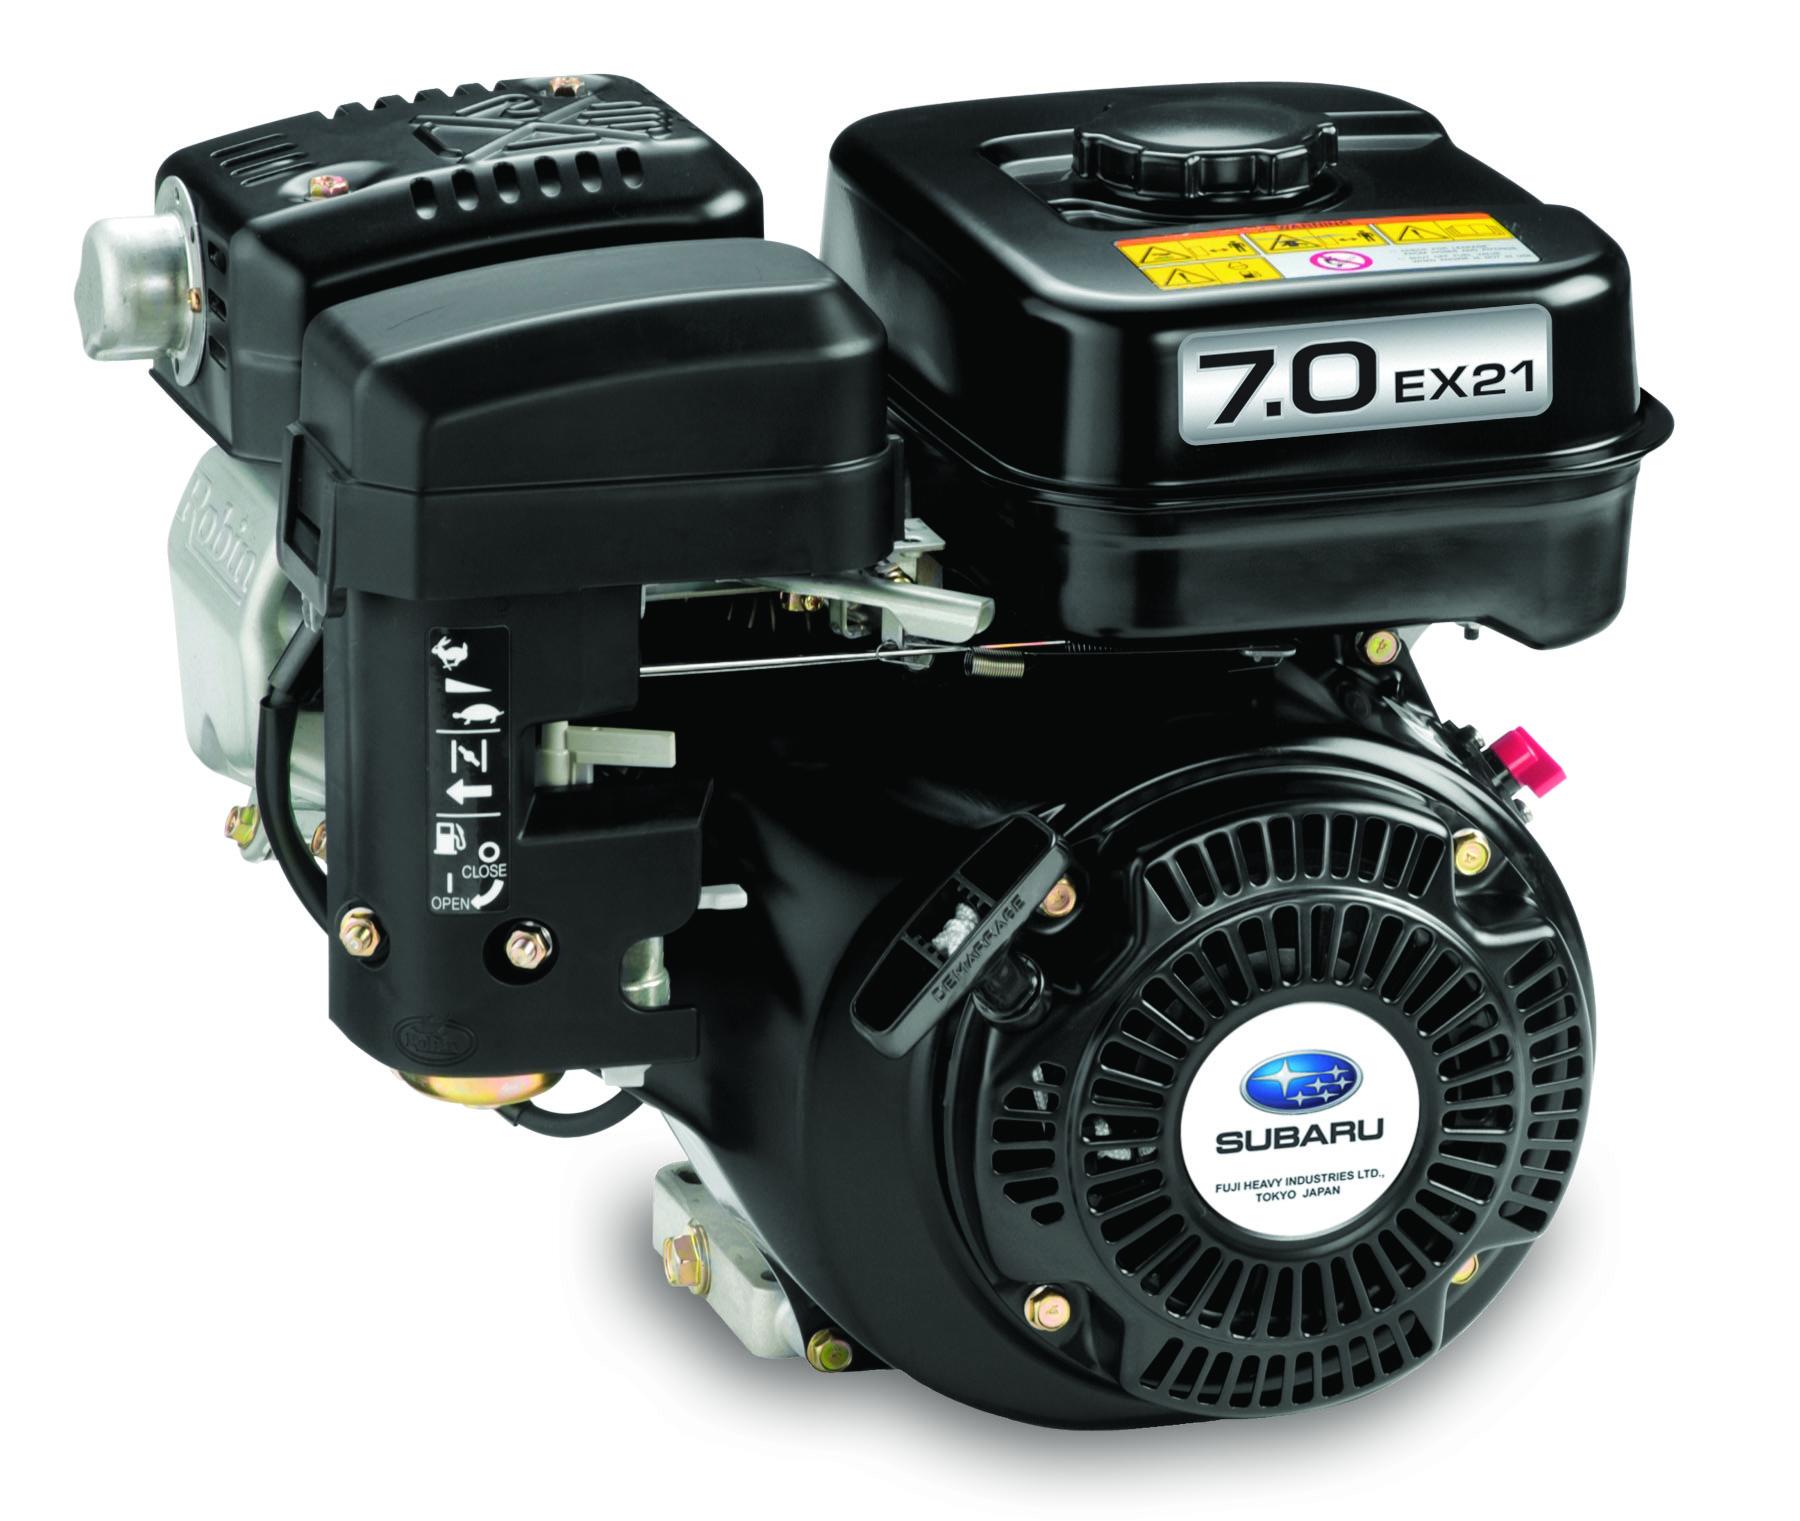 Subaru / Robin – Parts – Engines Plus